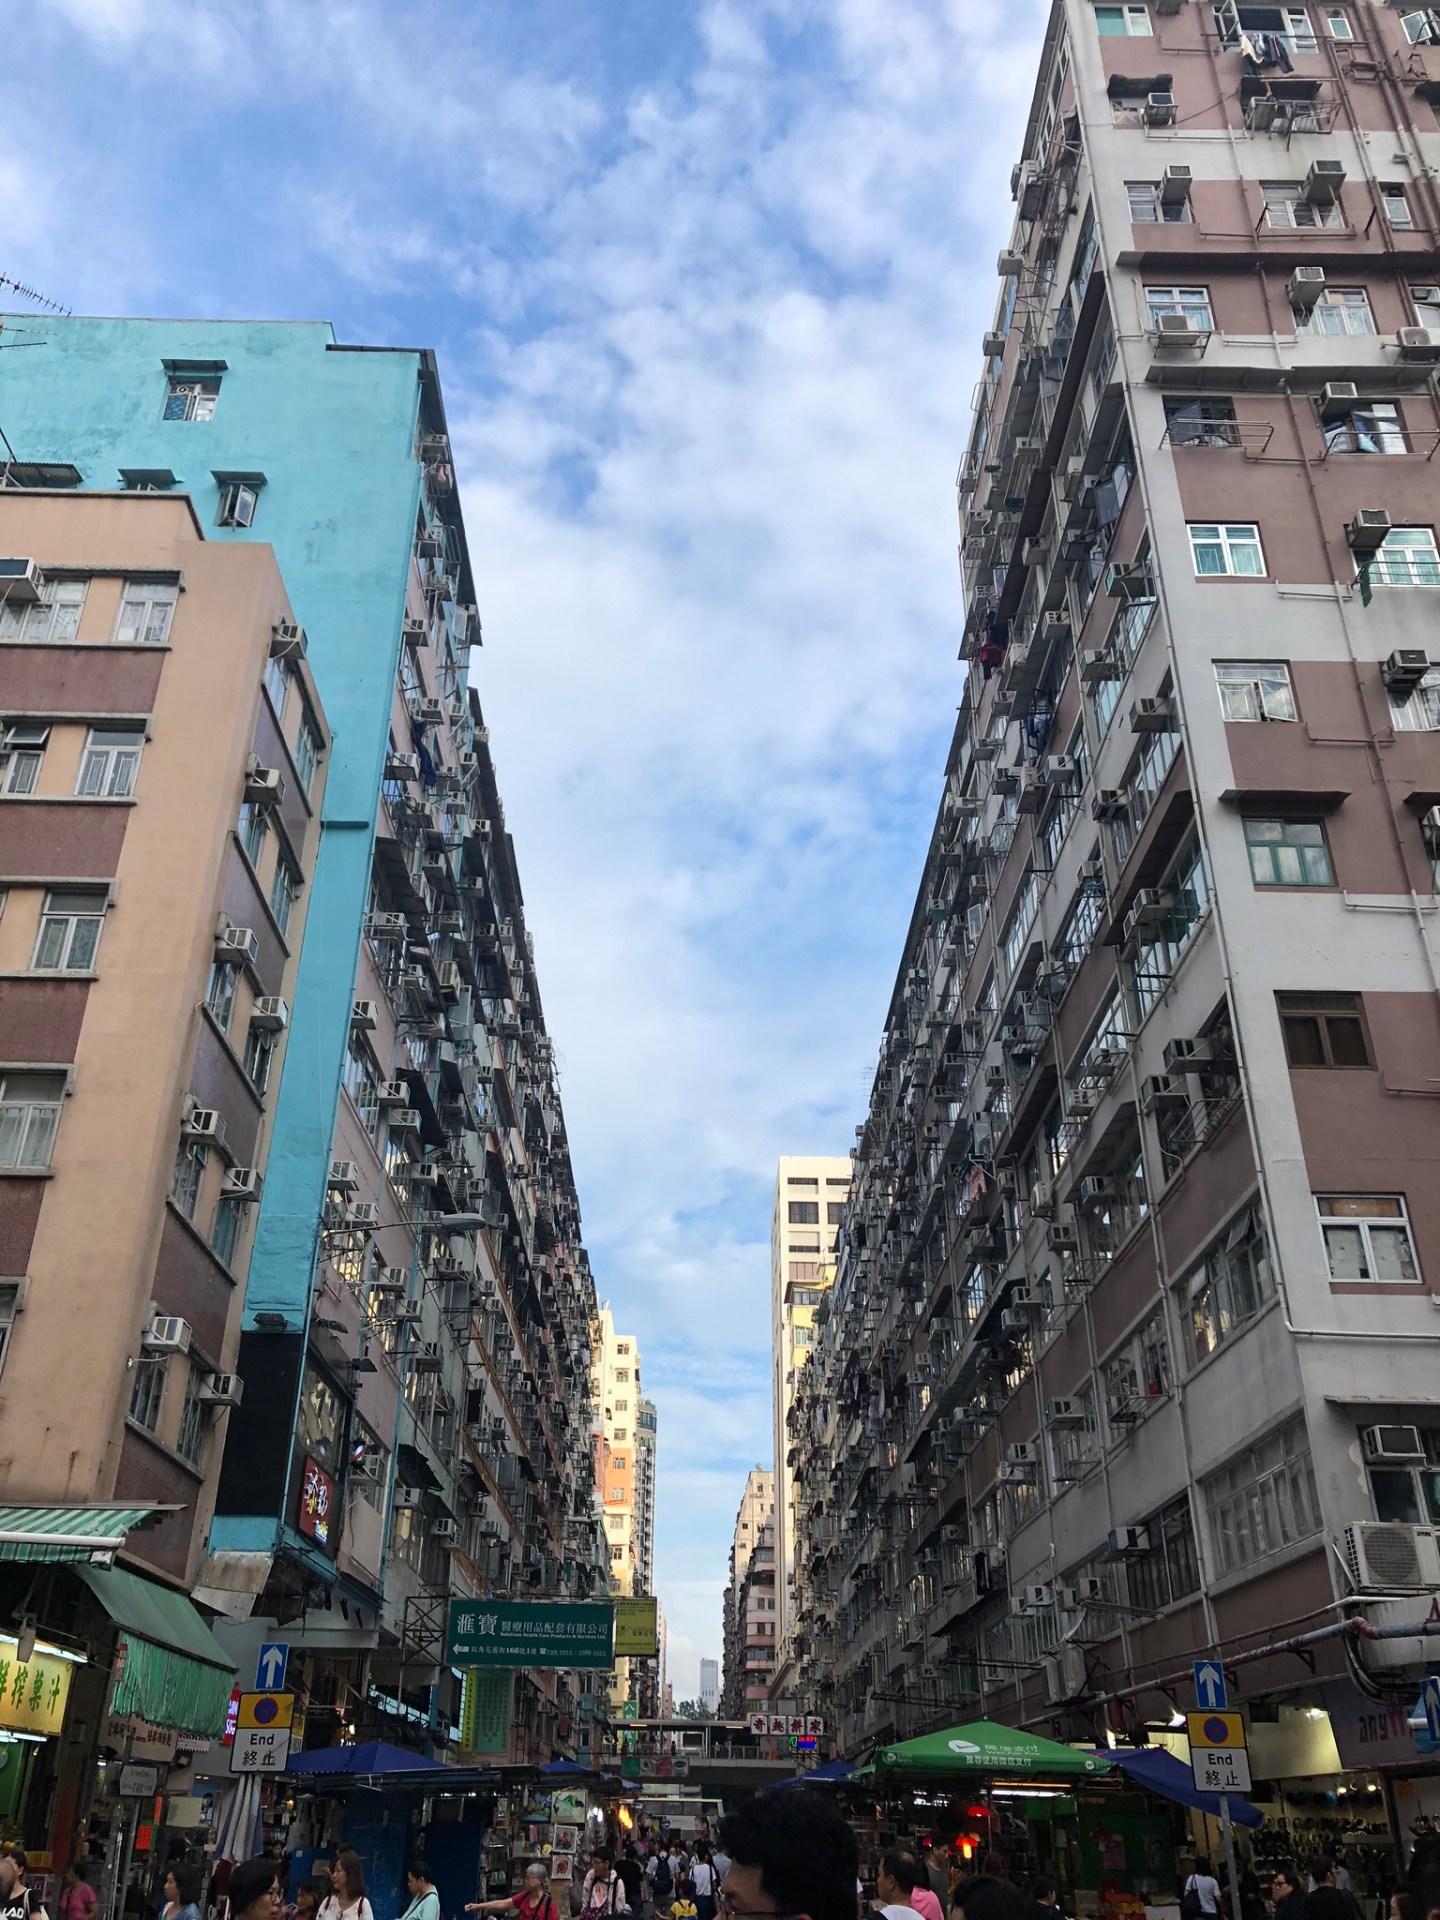 Streets of Mong Kok, Hong Kong